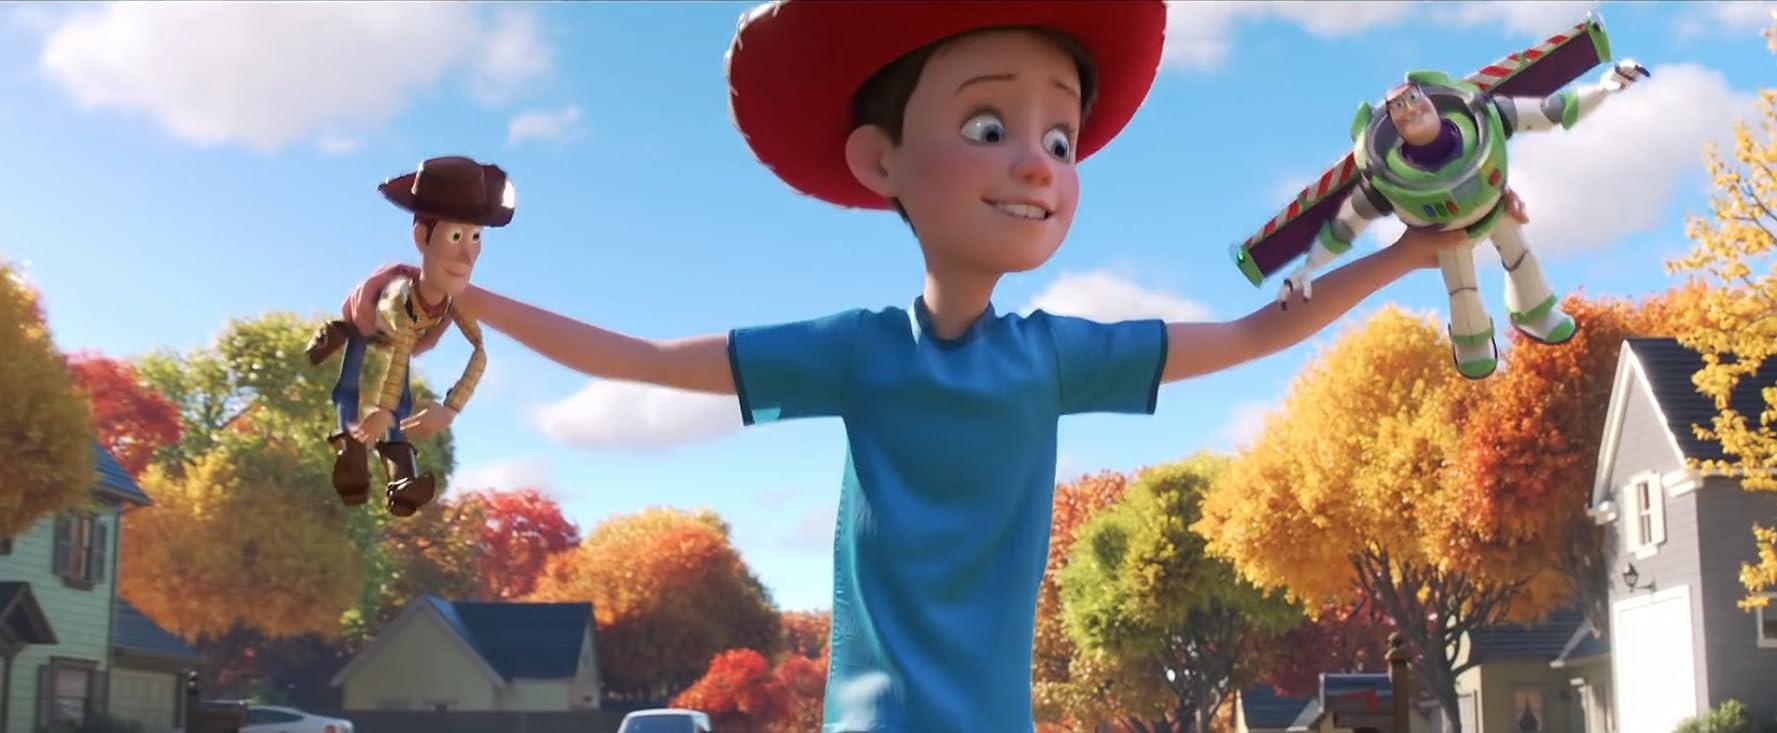 Povestea jucăriilor 4 - Toy Story 4 (2019) Online Subtitrat in Romana